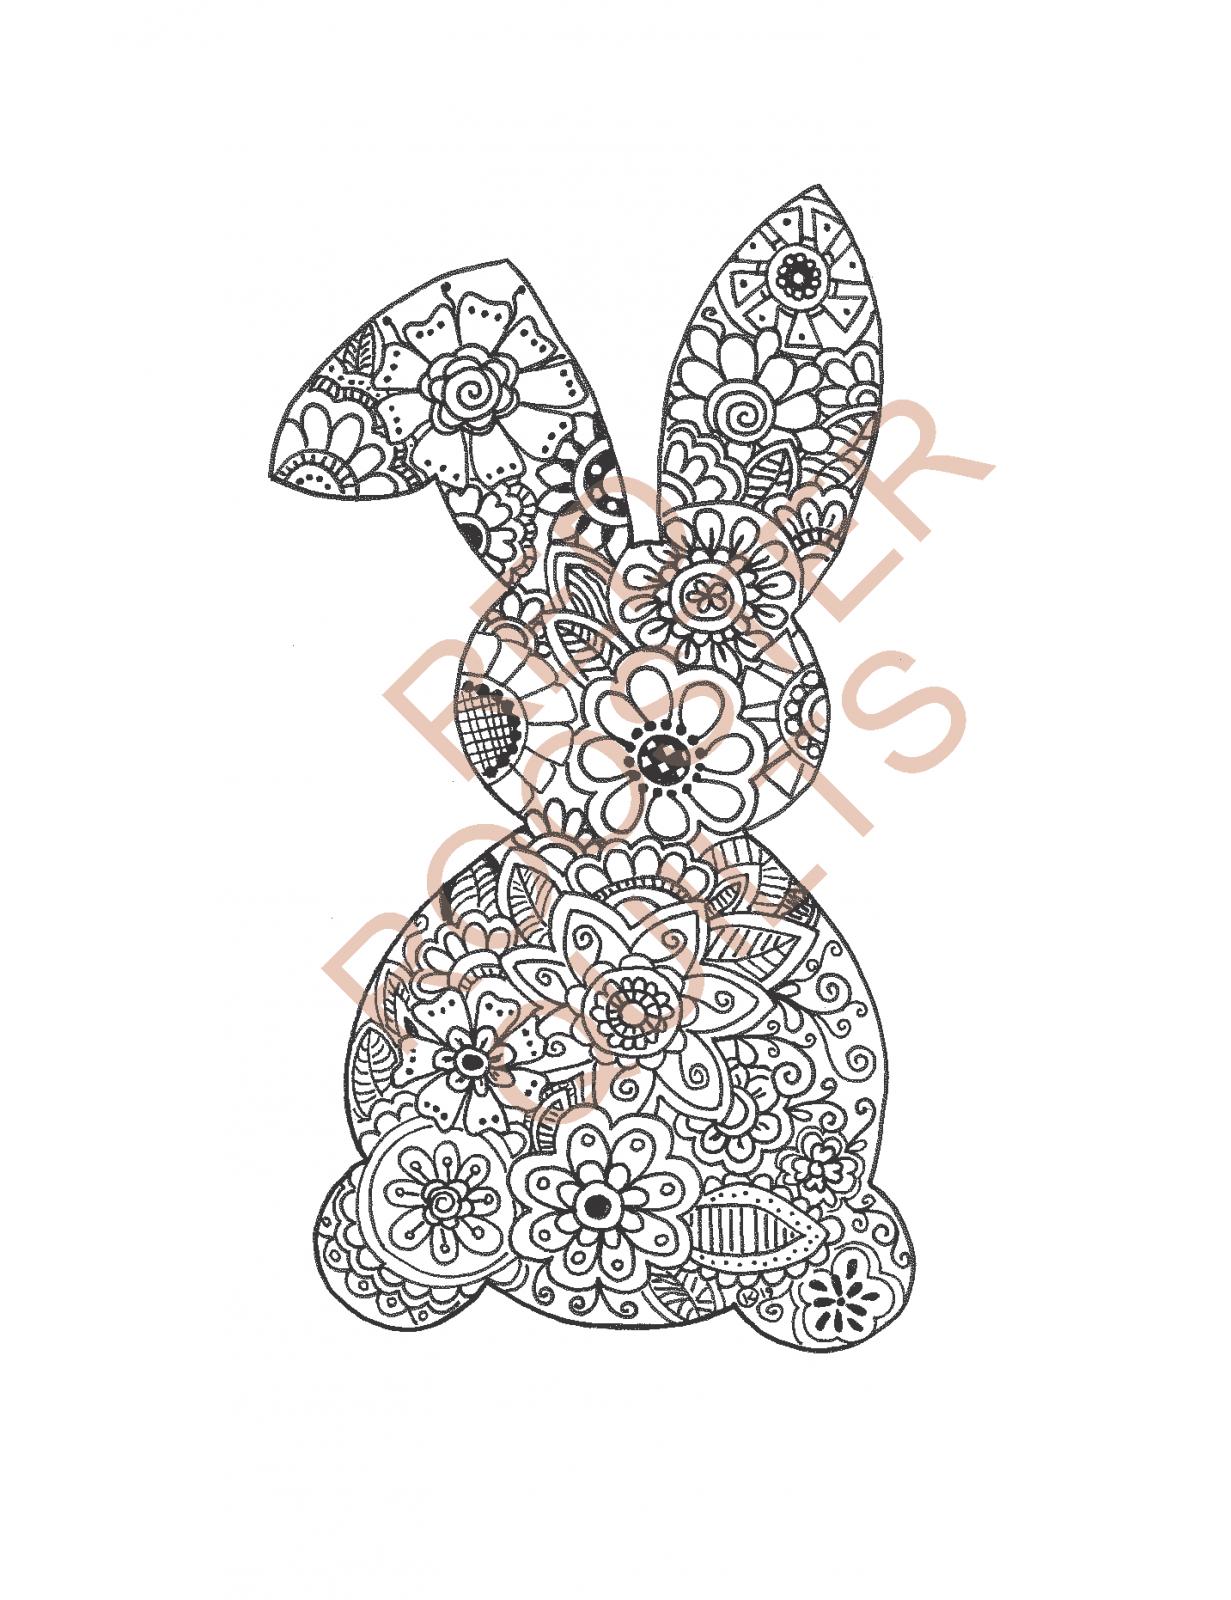 Zentangle Inspired Bunny (small) Swatch - RRQ Original